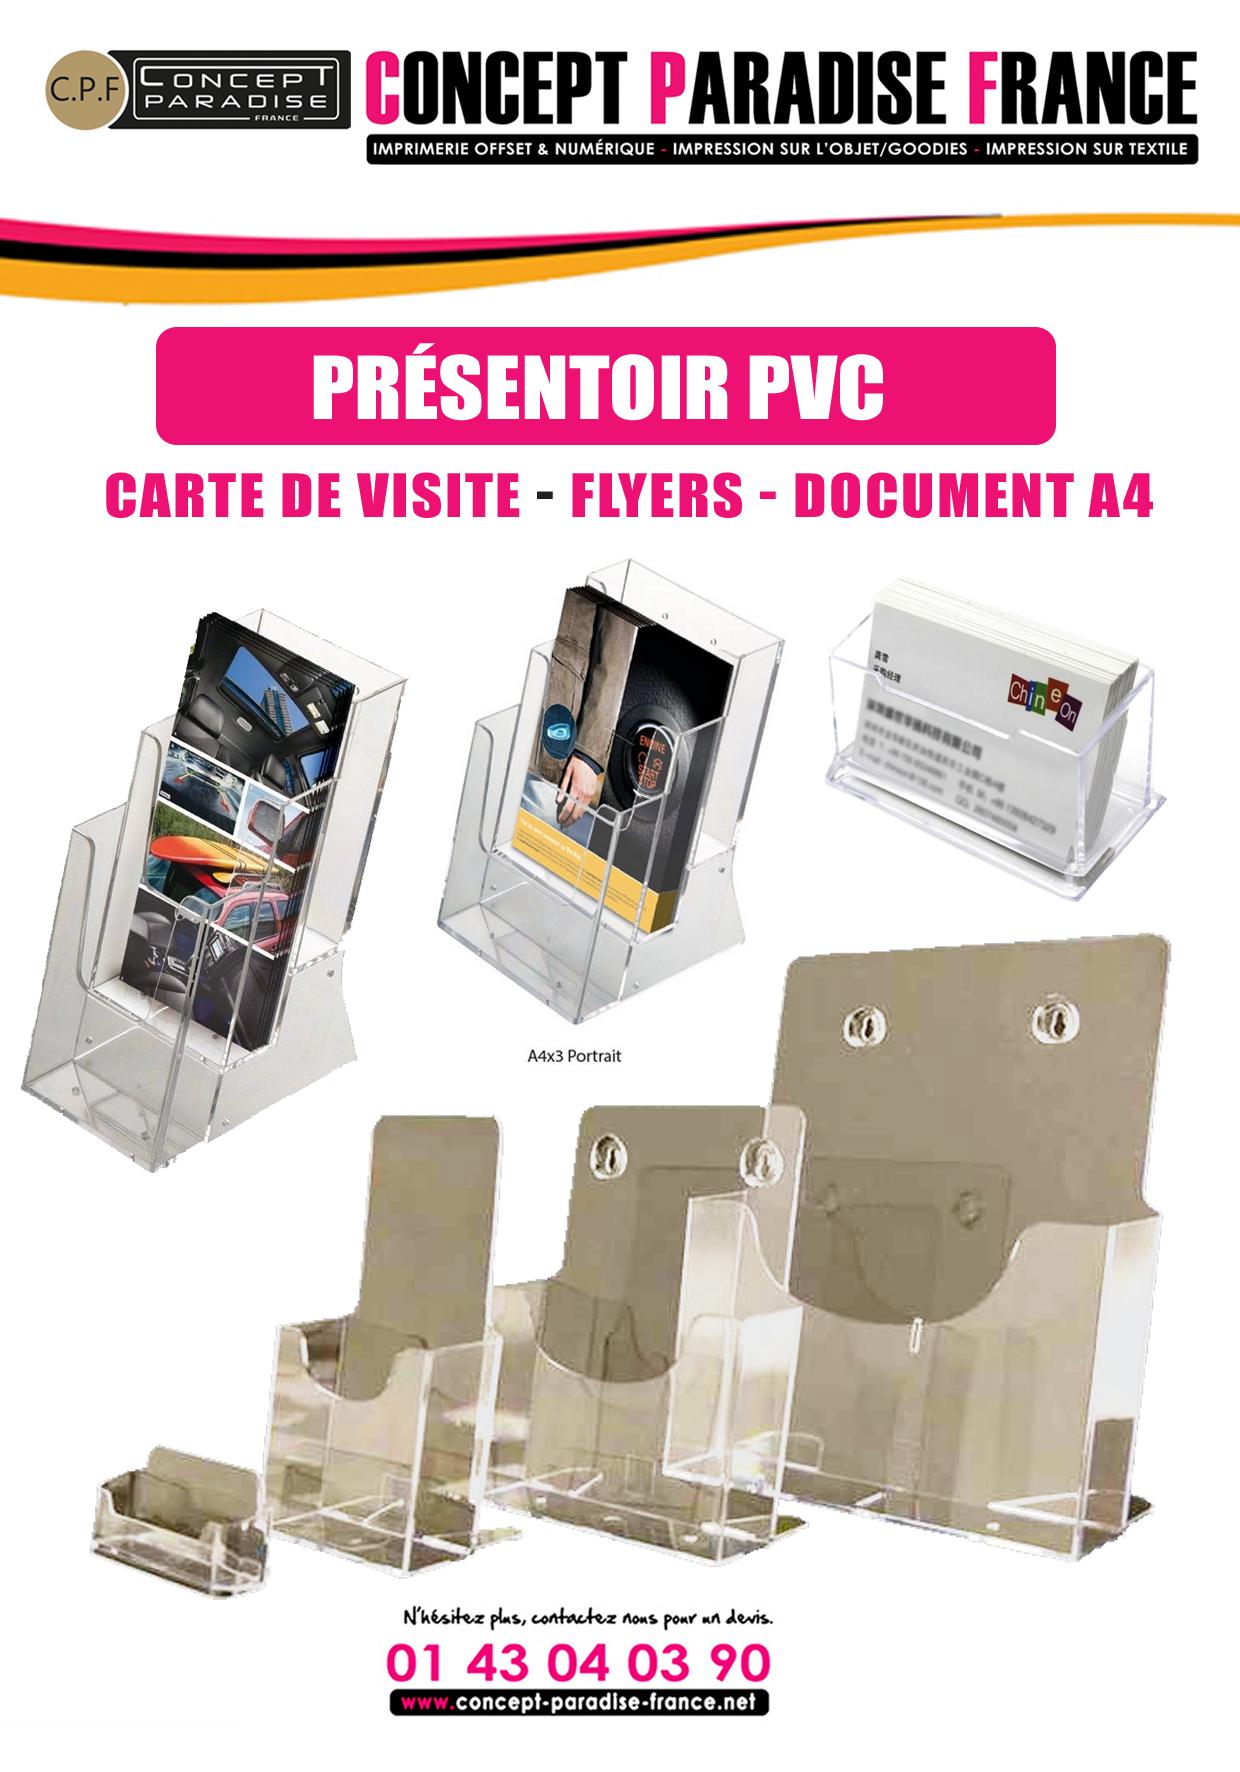 PRÉSENTOIR PVC DE FLYERS